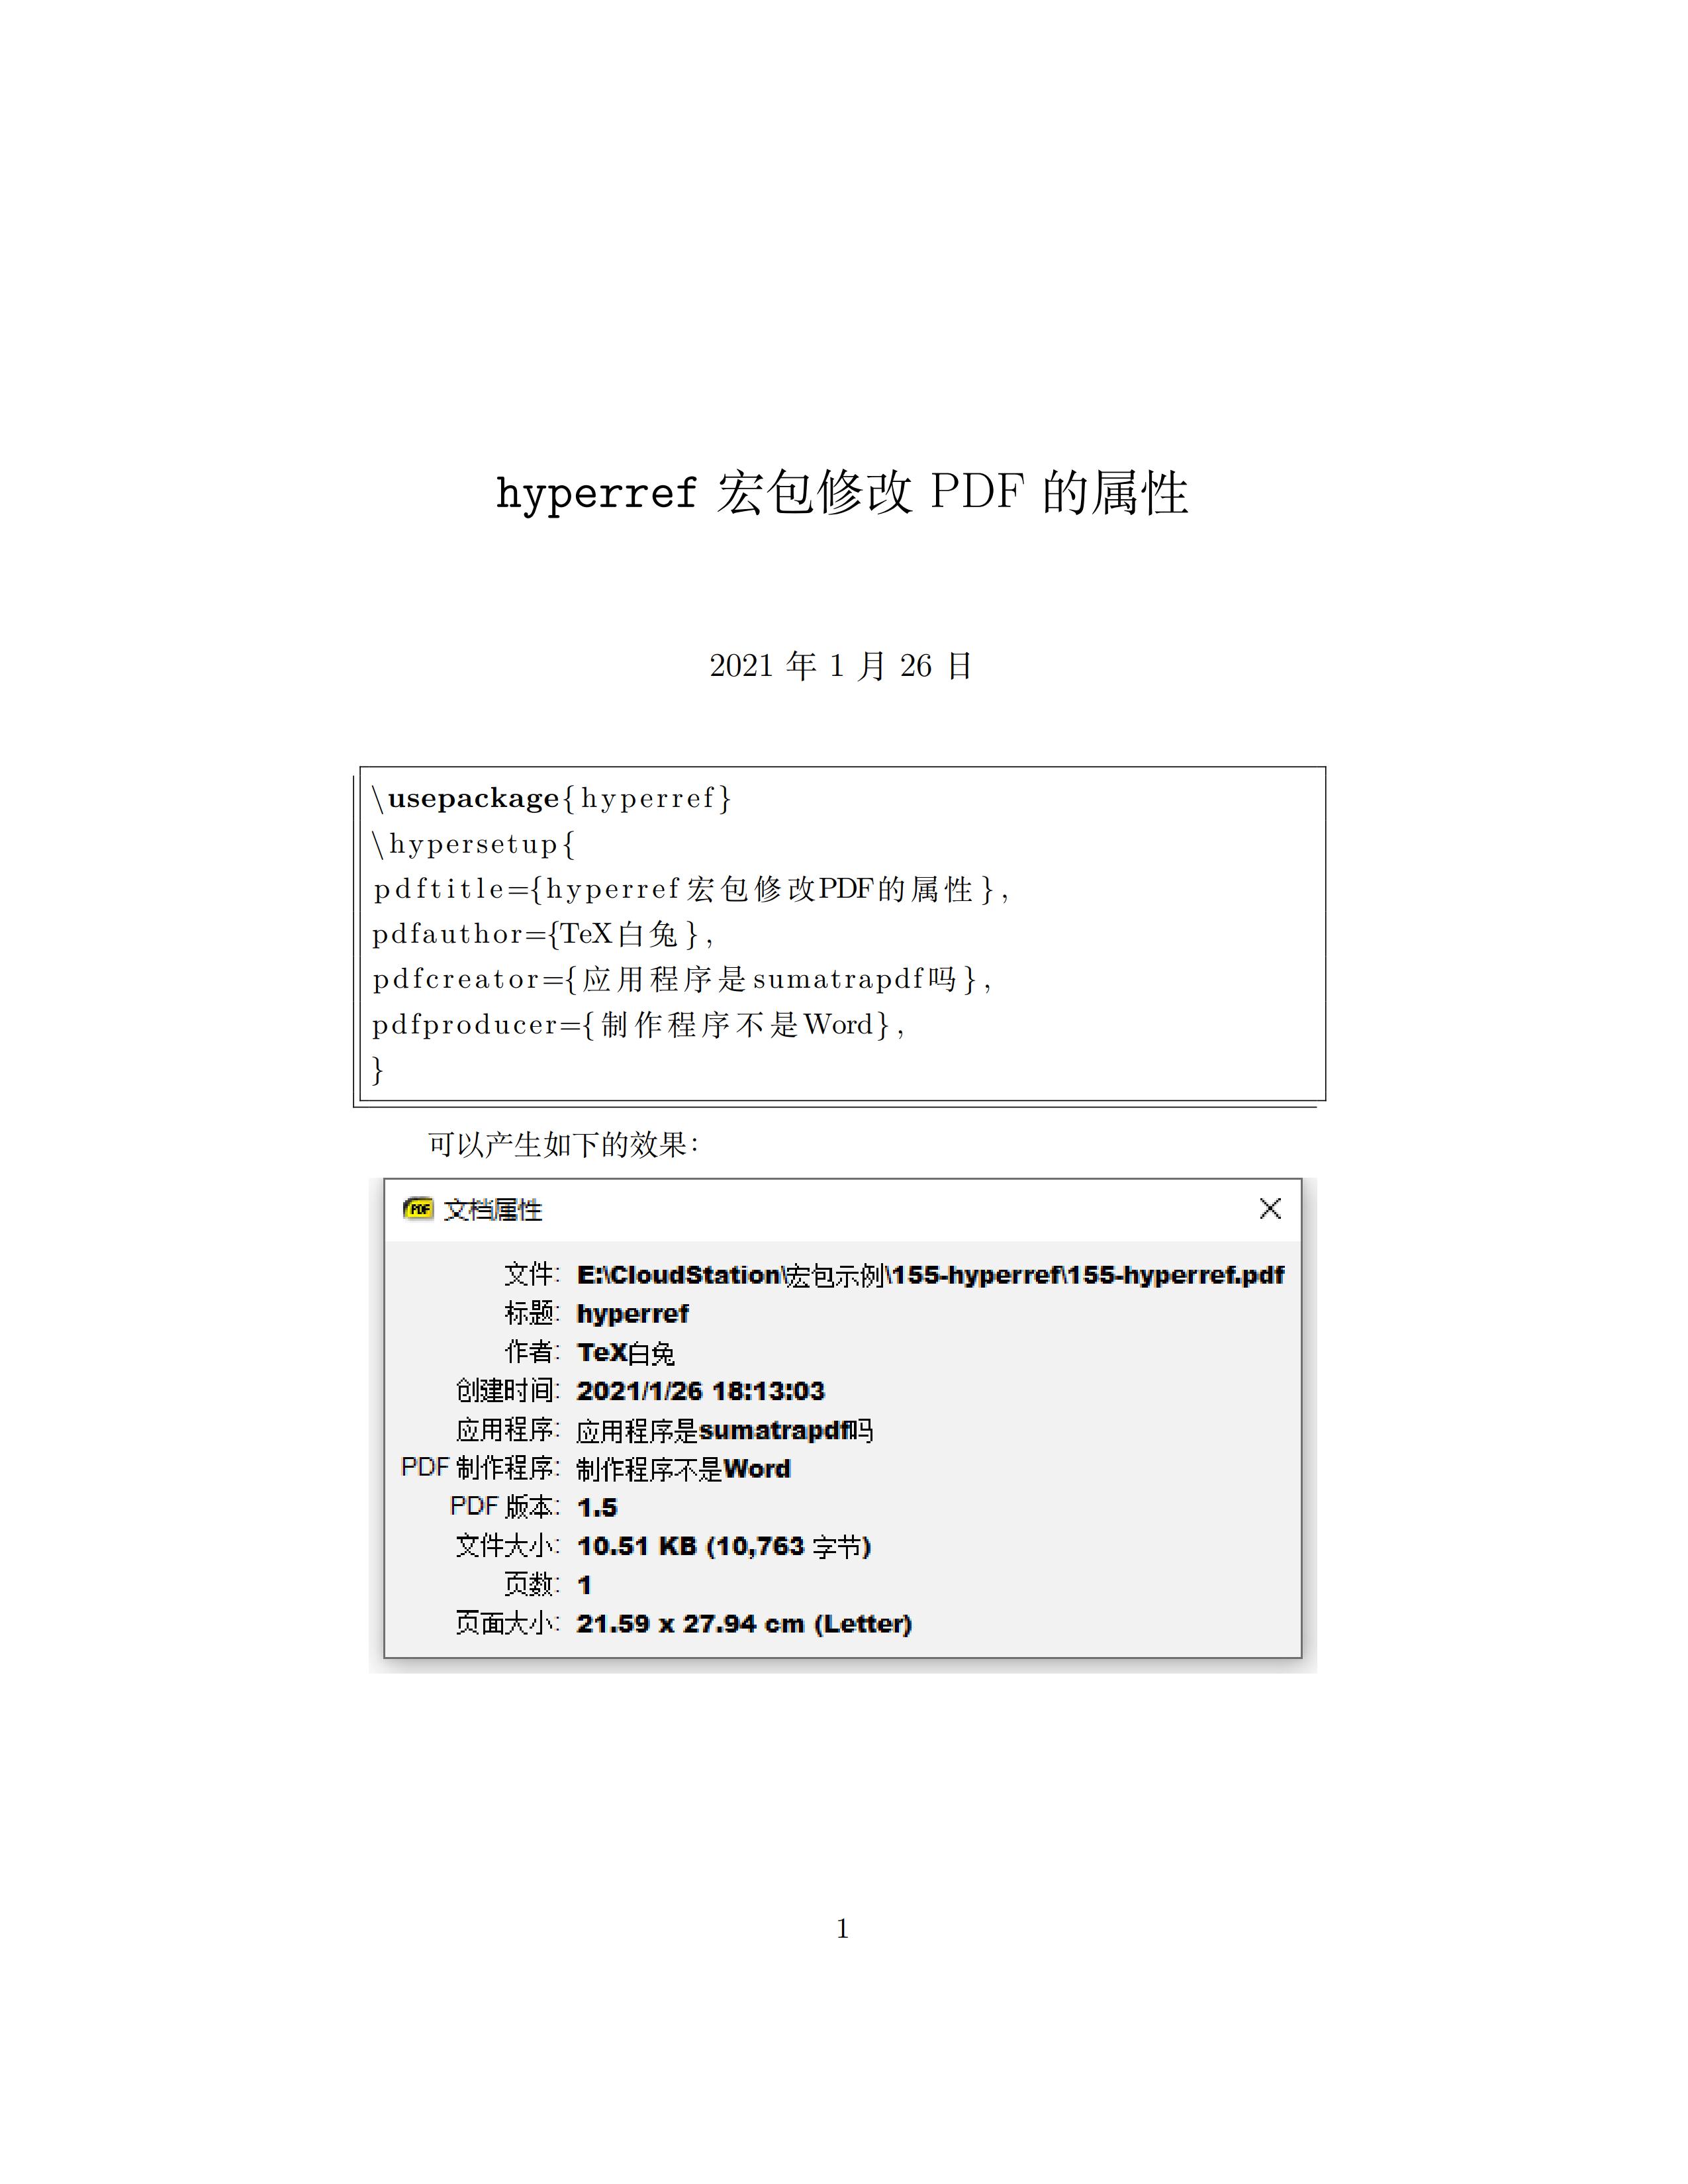 hyperref 修改 PDF 文档的属性